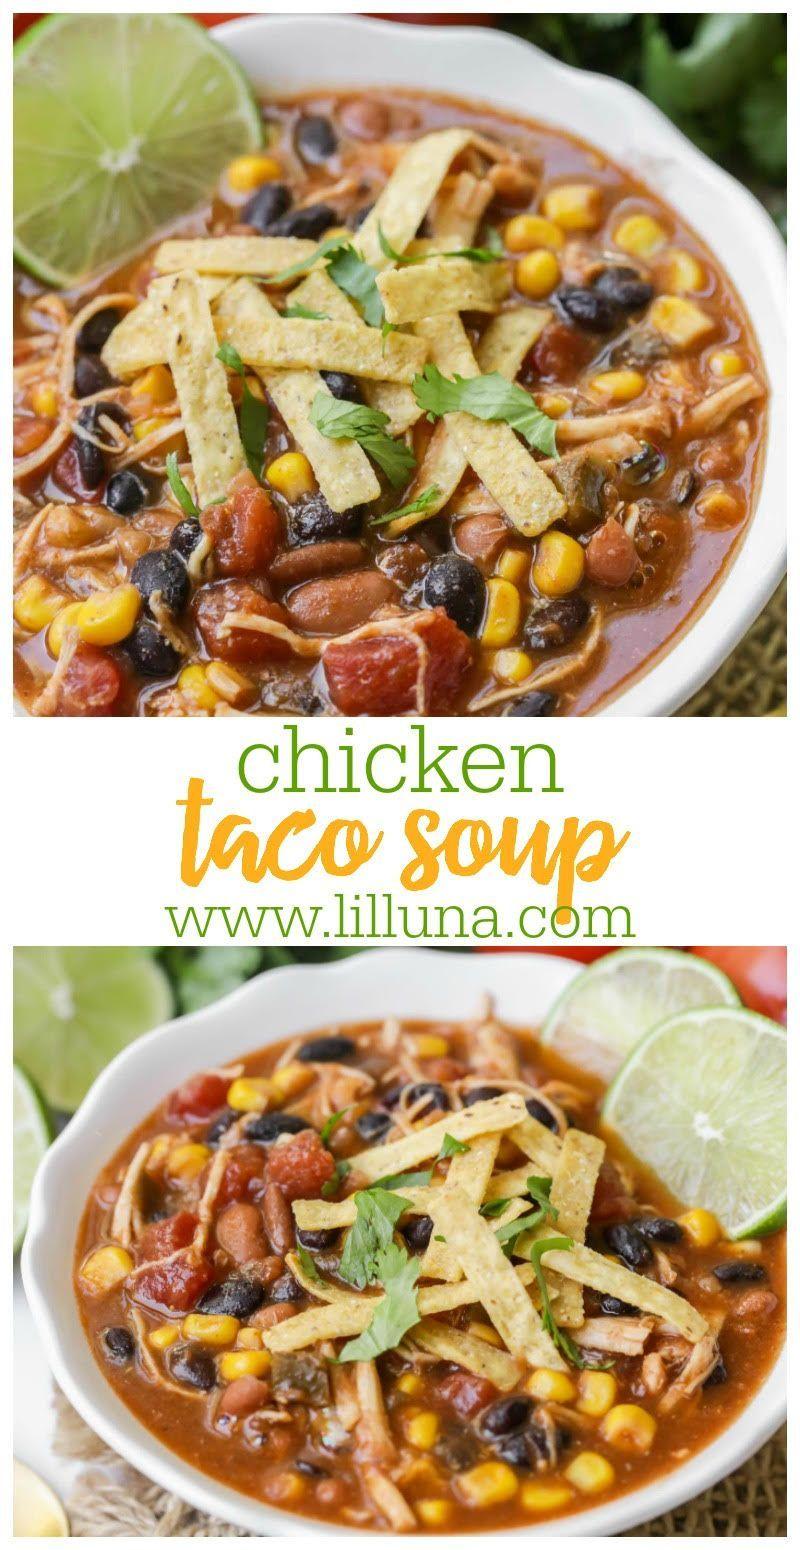 Easy Chicken Taco Soup Recipe - so simple and so good!   Lil' Luna